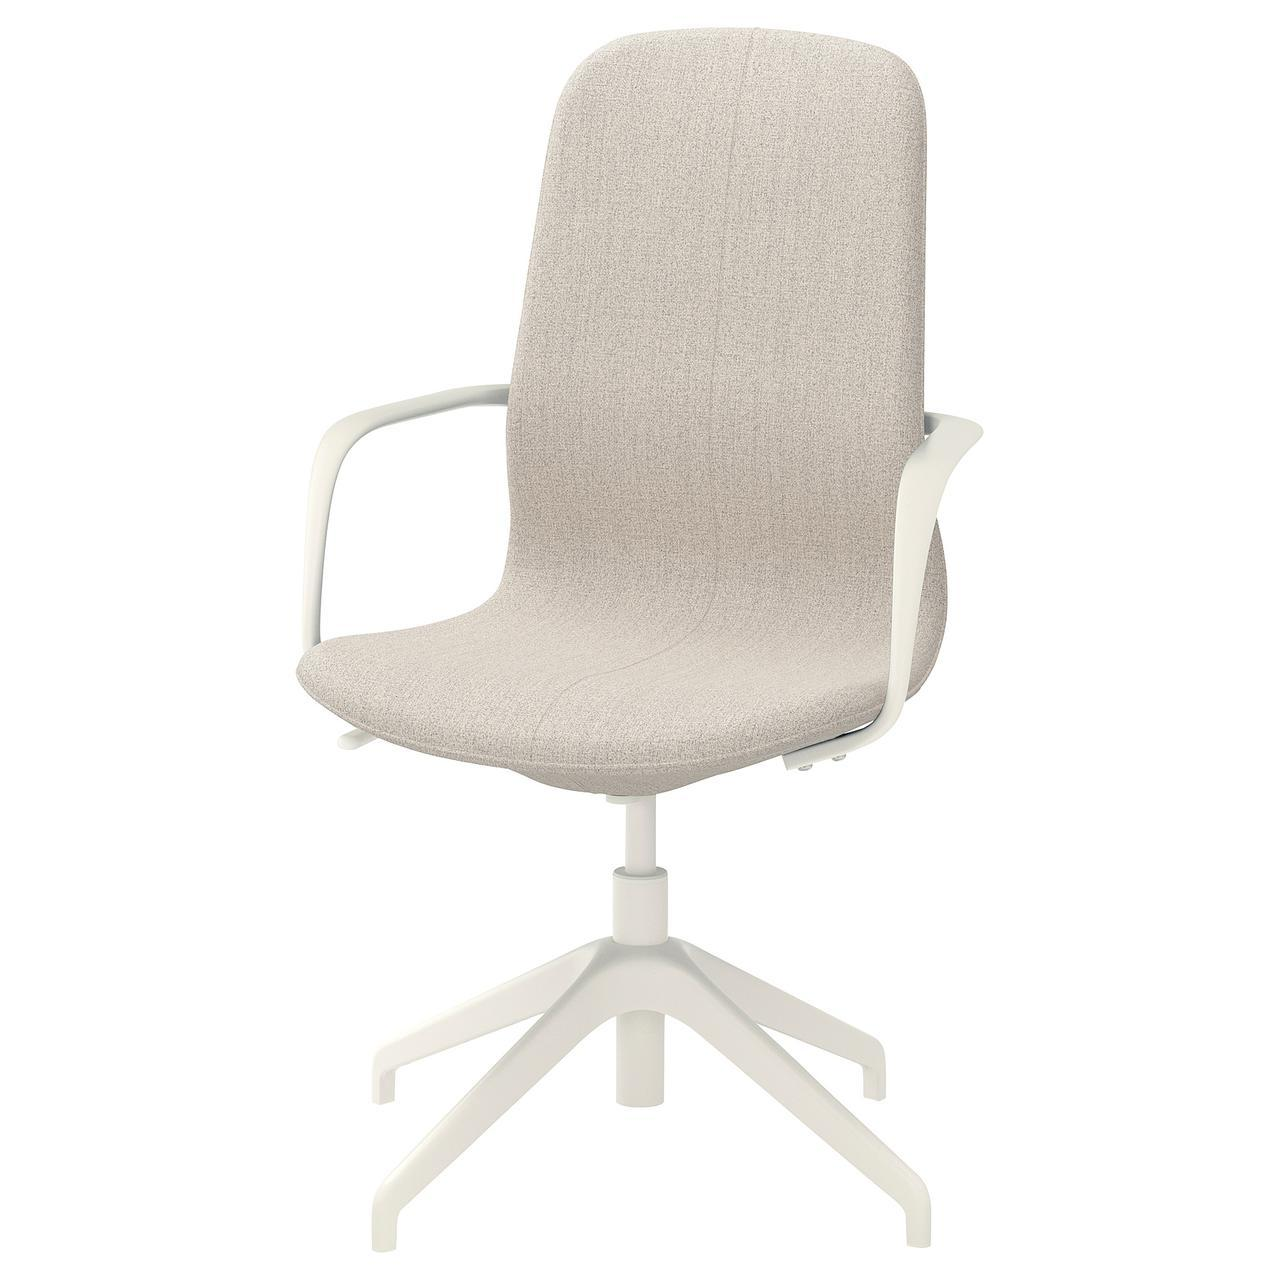 IKEA LANGFJALL (592.525.95) Компьютерное кресло, Гуннаред темно-серый